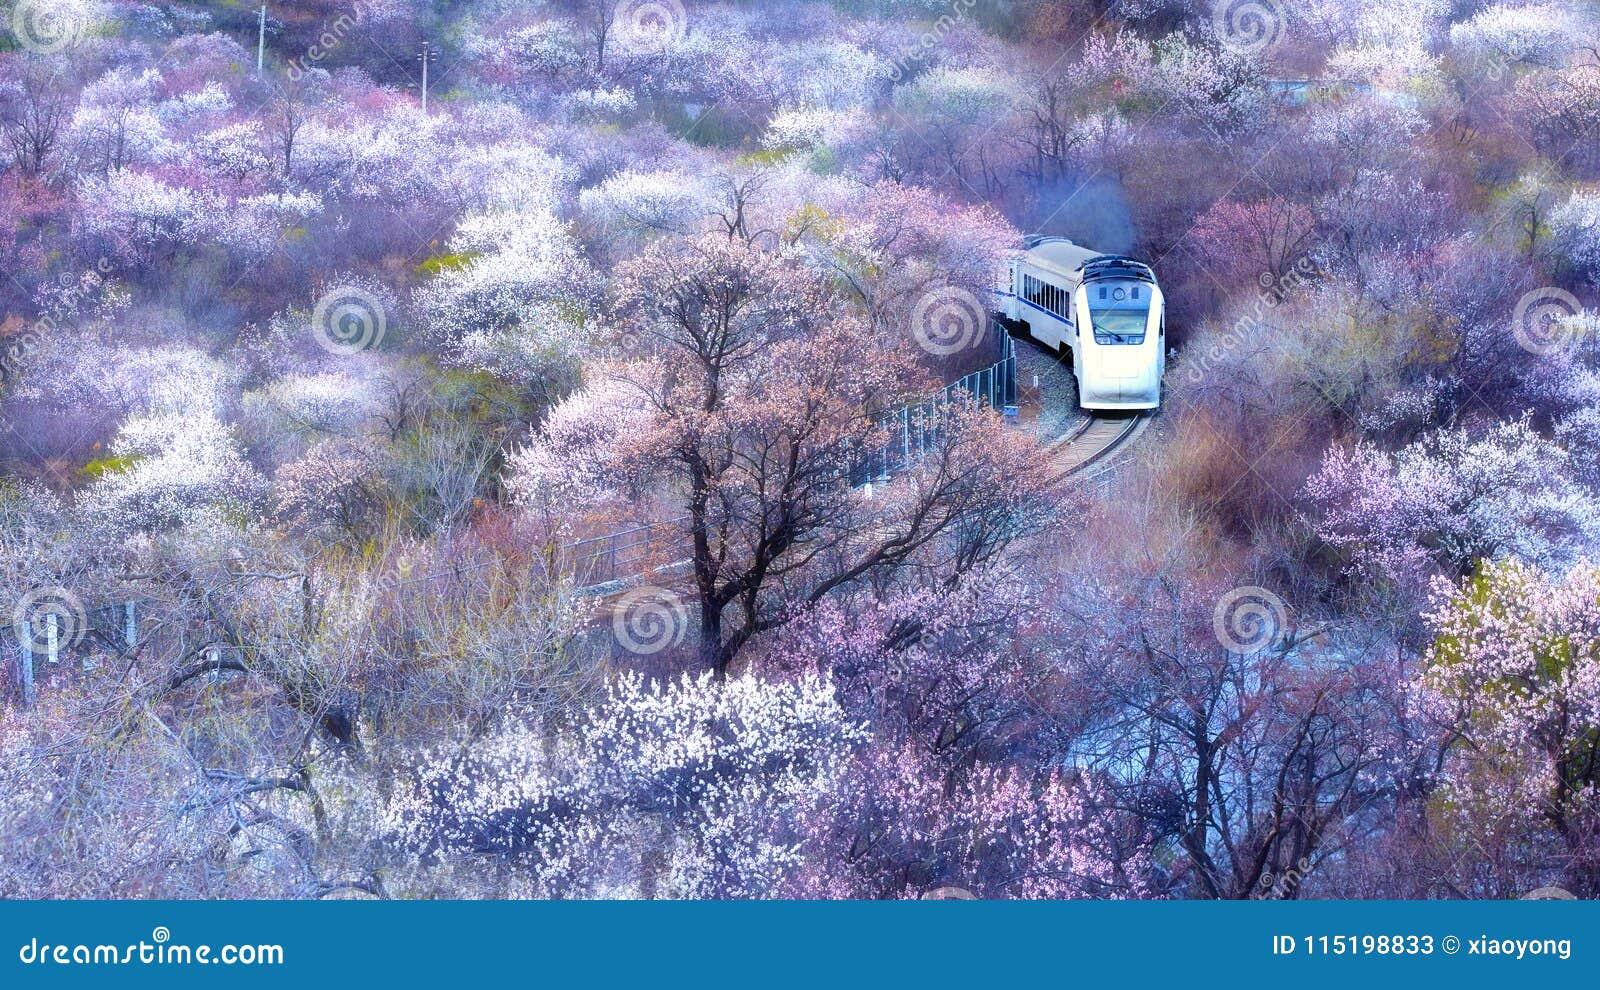 China high speed train running through ocean of flowers